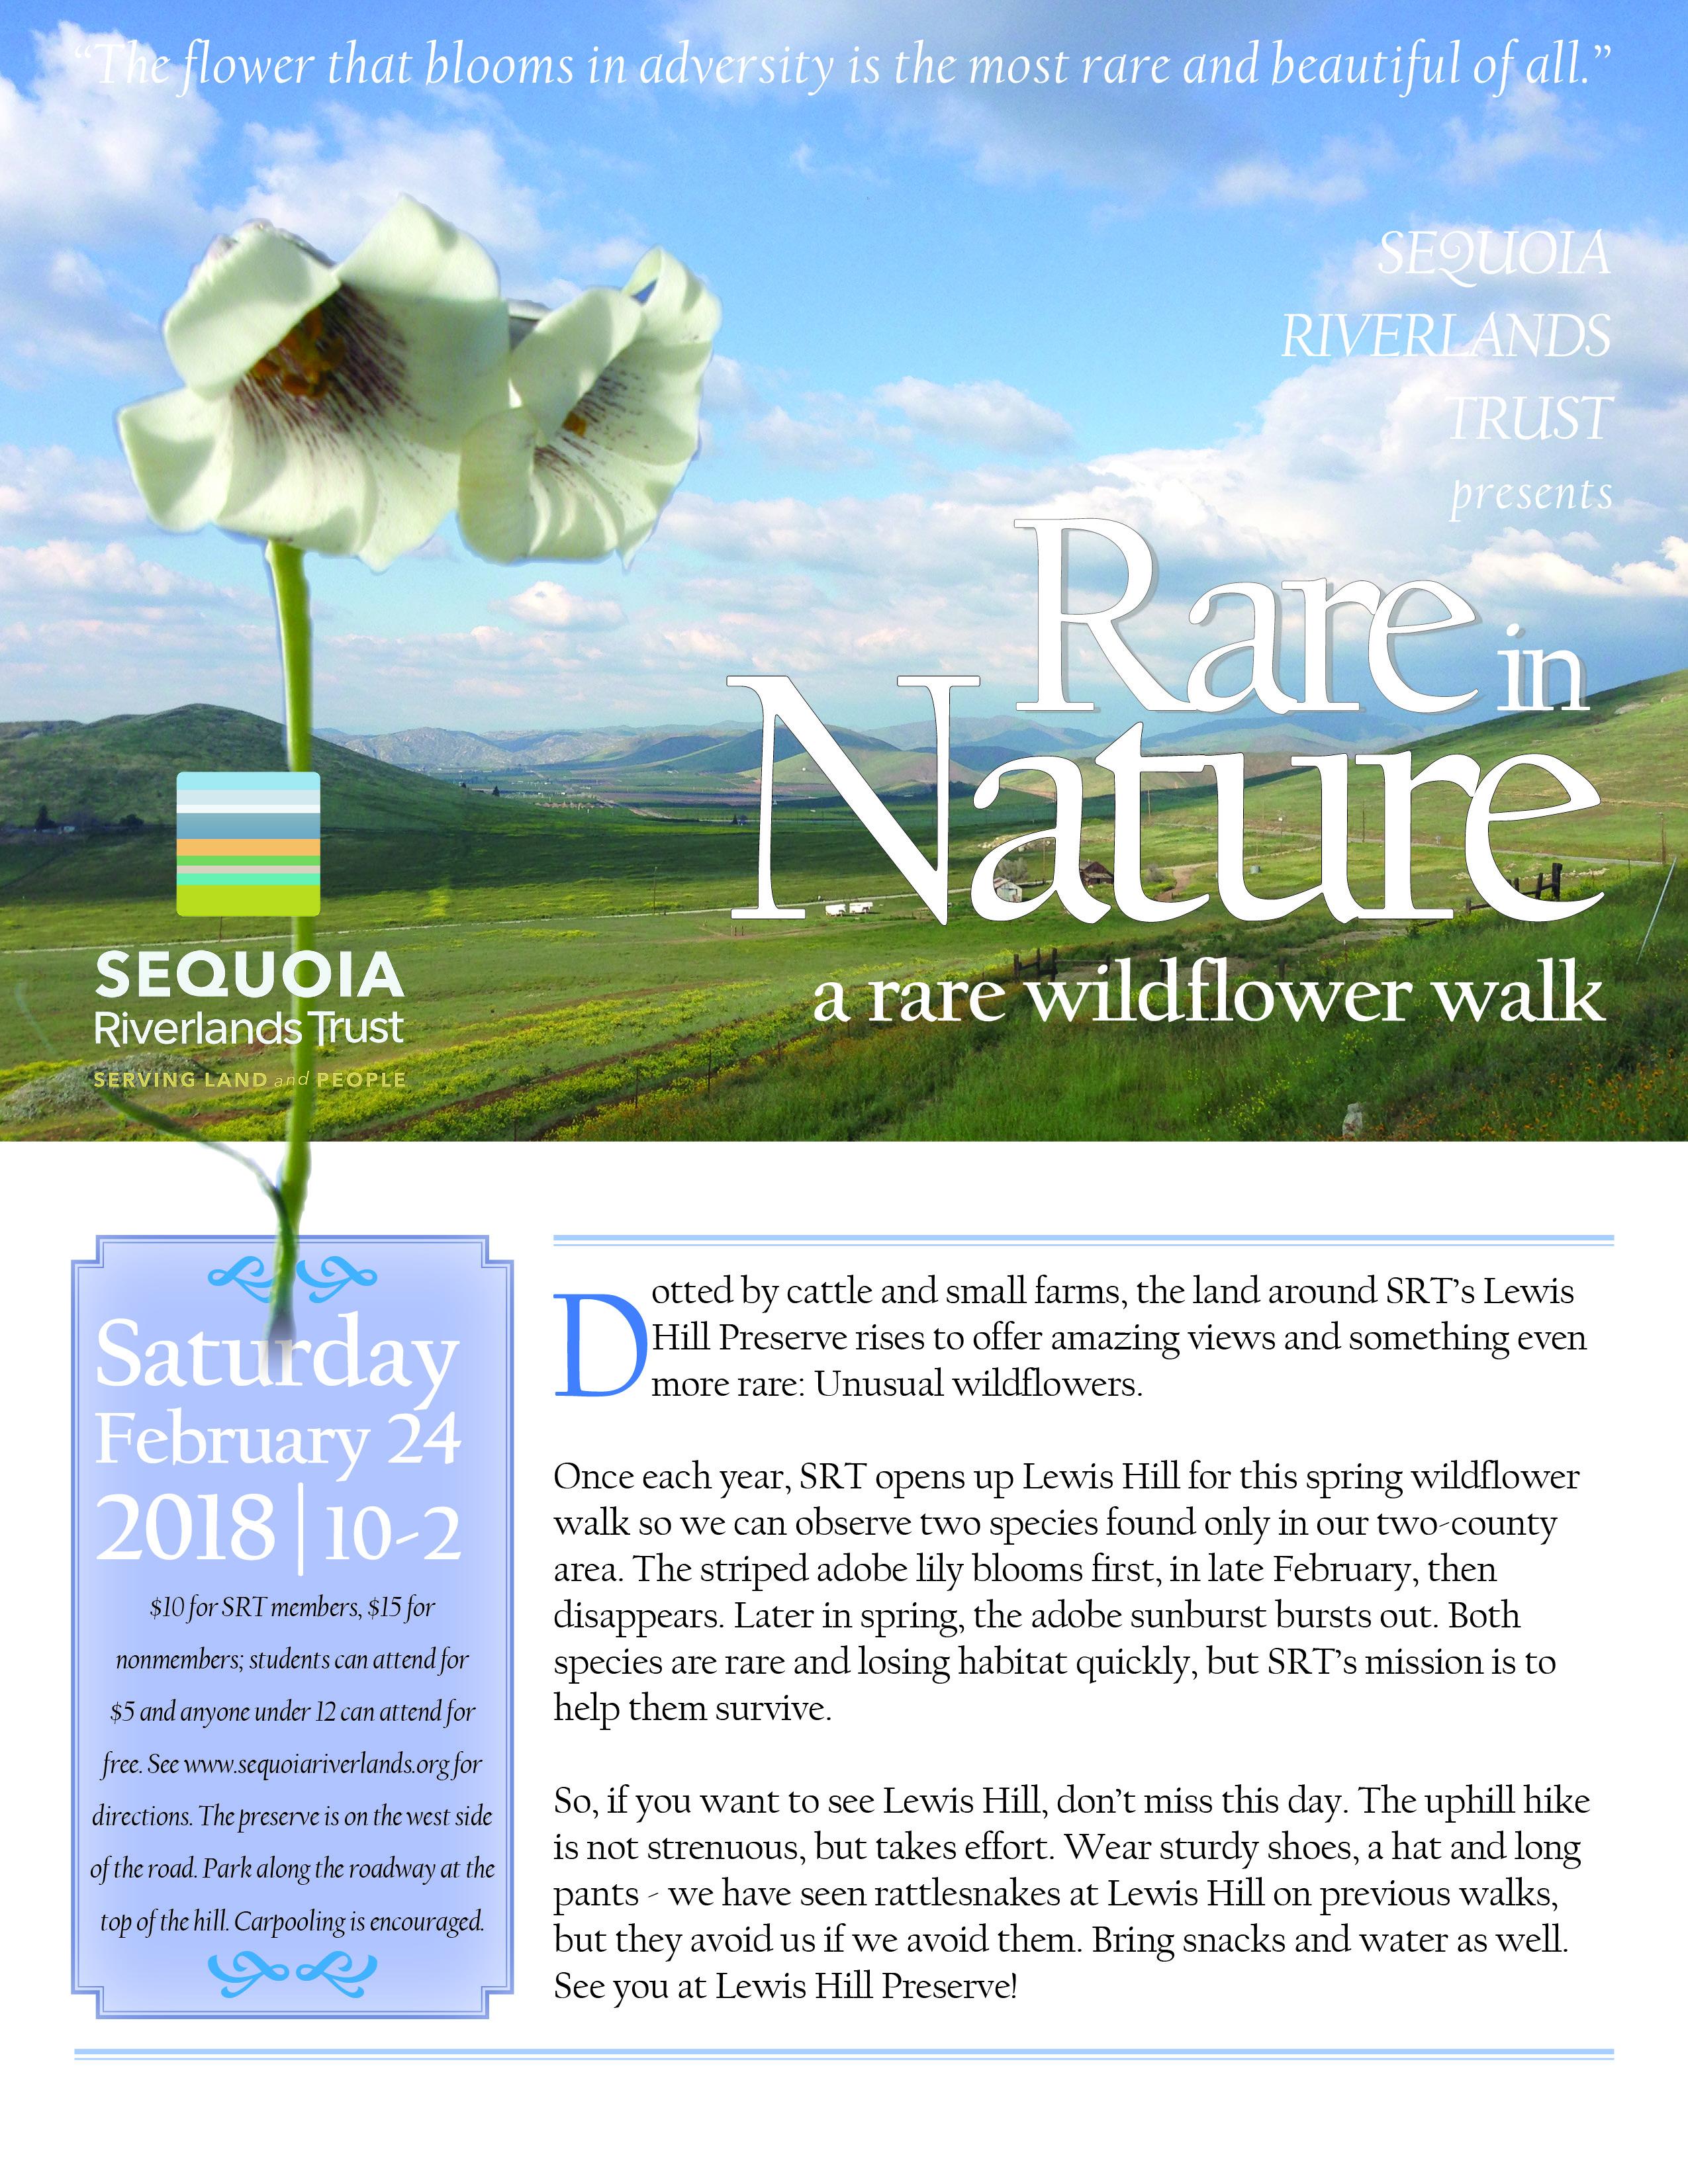 Annual walk at Lewis Hill Preserve returns Feb. 24